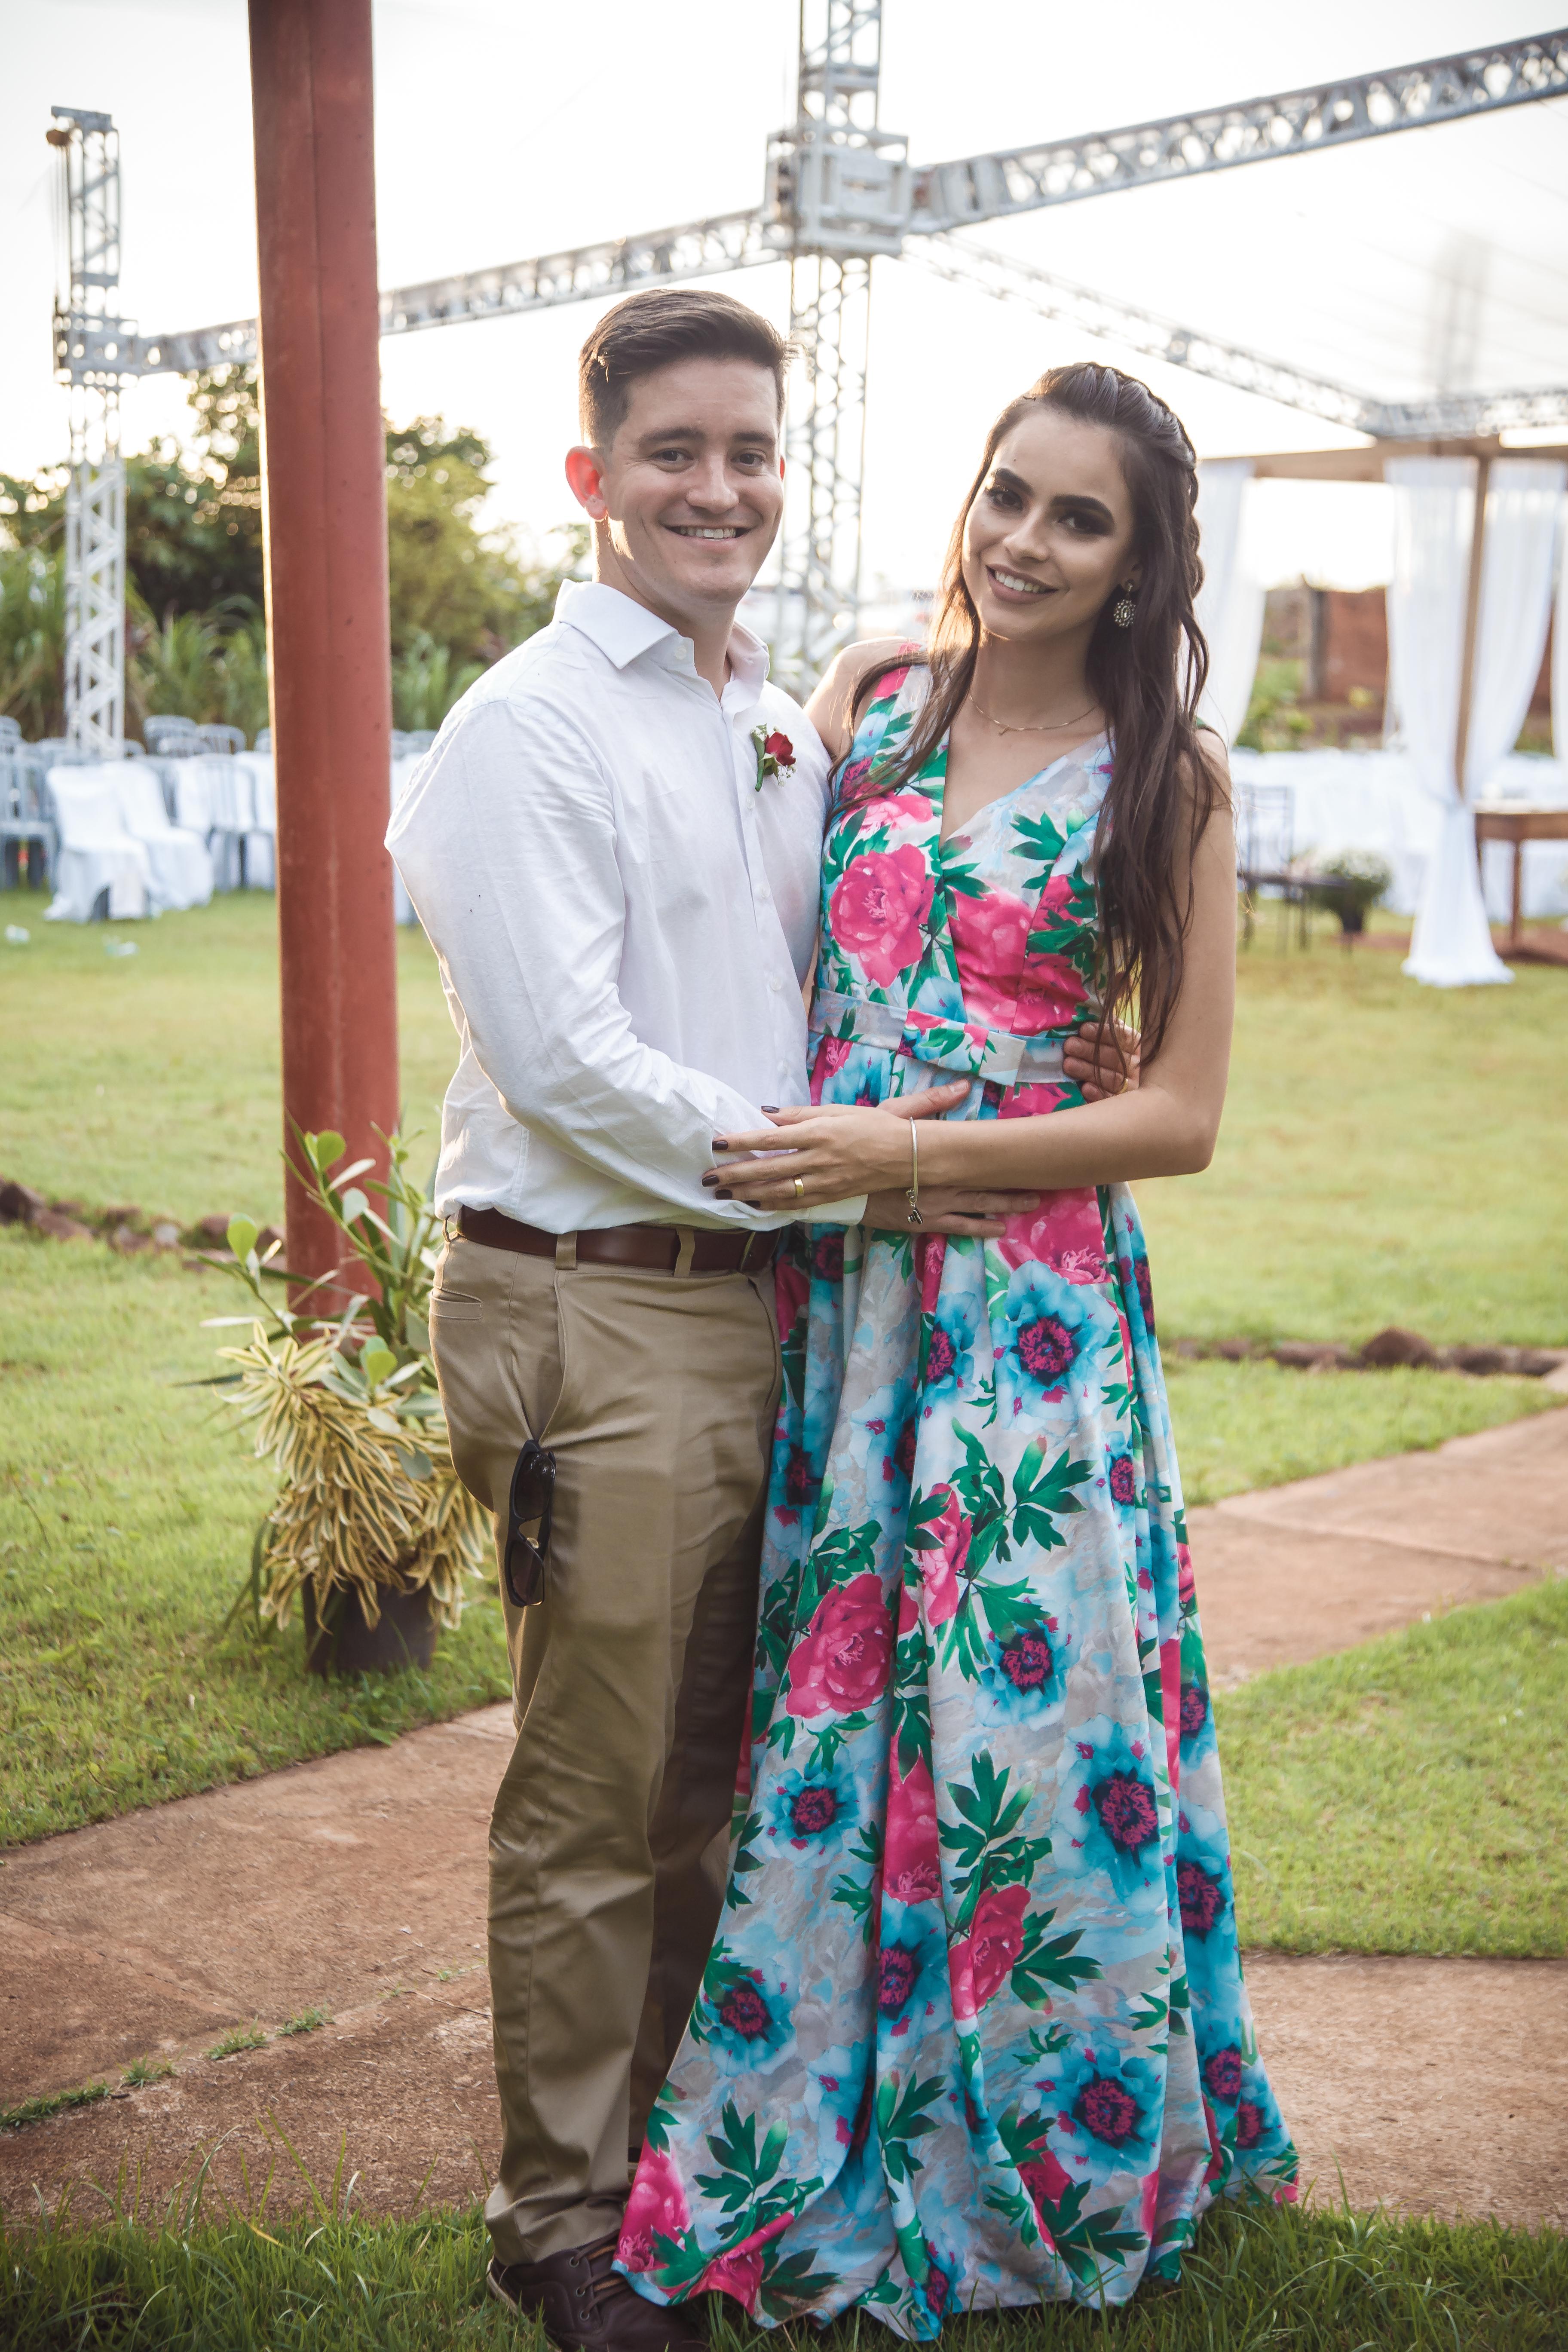 Contate Carlos Nikito Fotografia, fotógrafo de casamentos. Itumbiara - Goiás